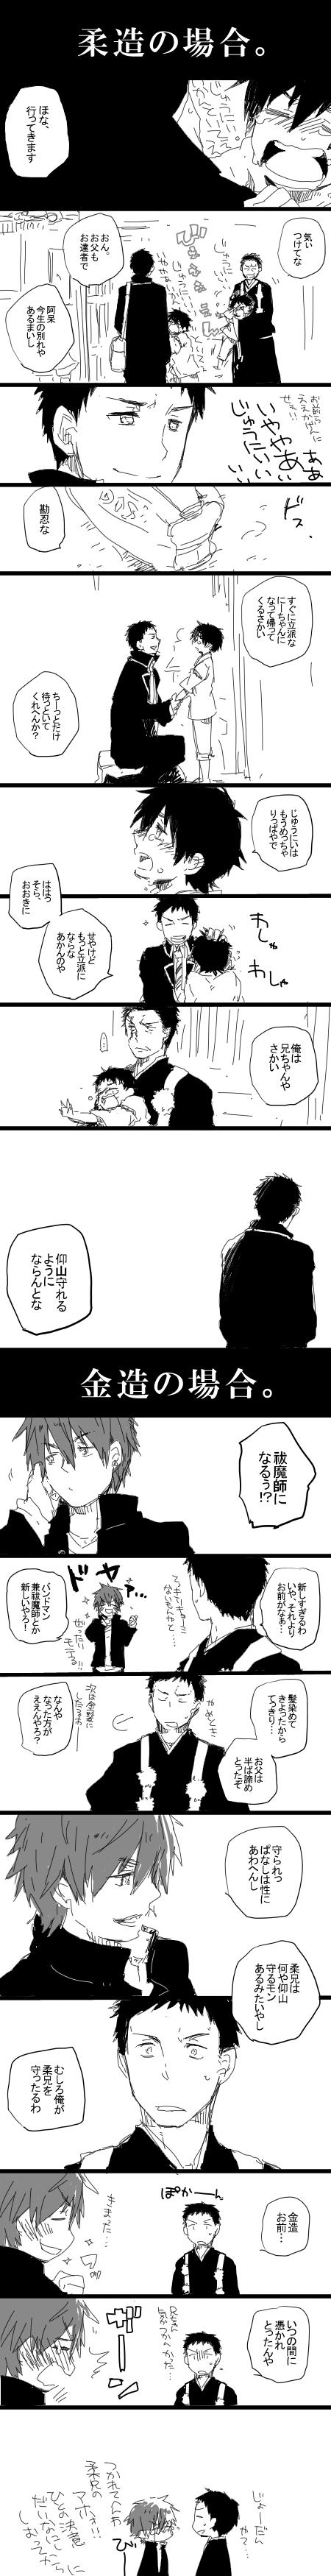 Tags: Anime, Mizutani (Pixiv1728456), Ao no Exorcist, Shima Juuzou, Shima Renzou, Shima Kinzou, Shima Yaozou, Comic, Blue Exorcist